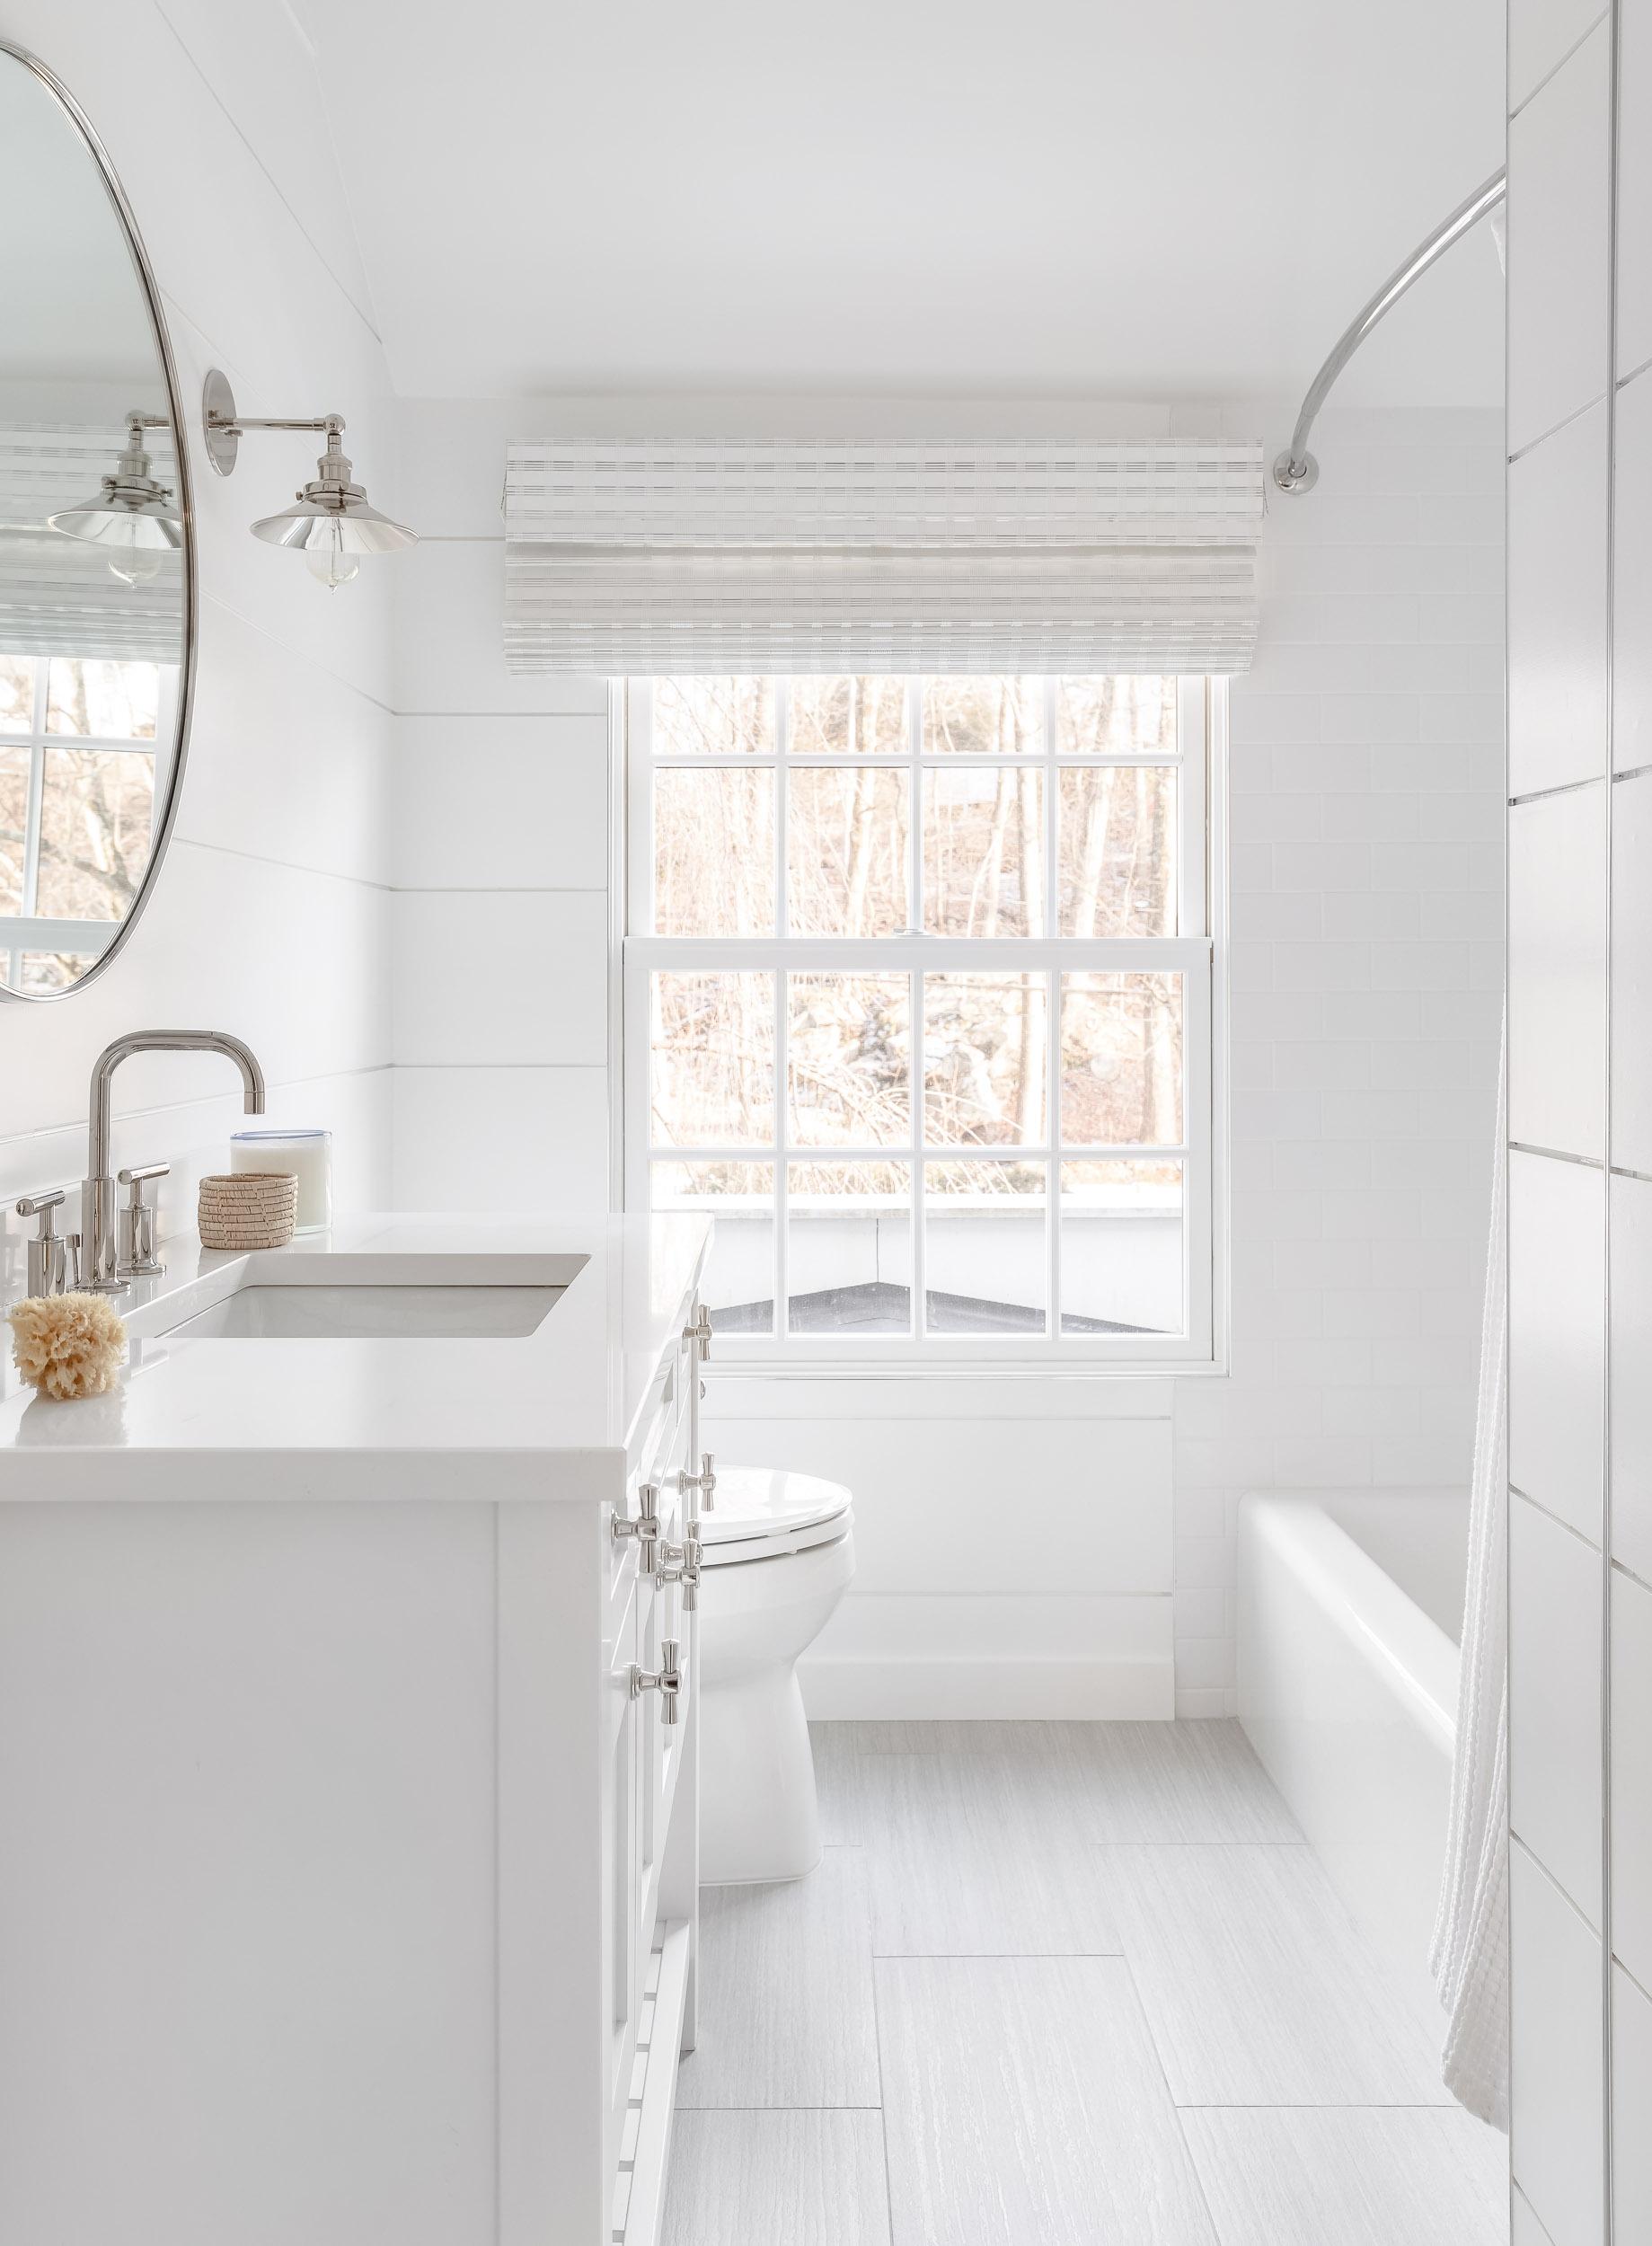 parker and parker design-interior design photography-darien ct-white & grey bathroom-shiplap walls.jpg